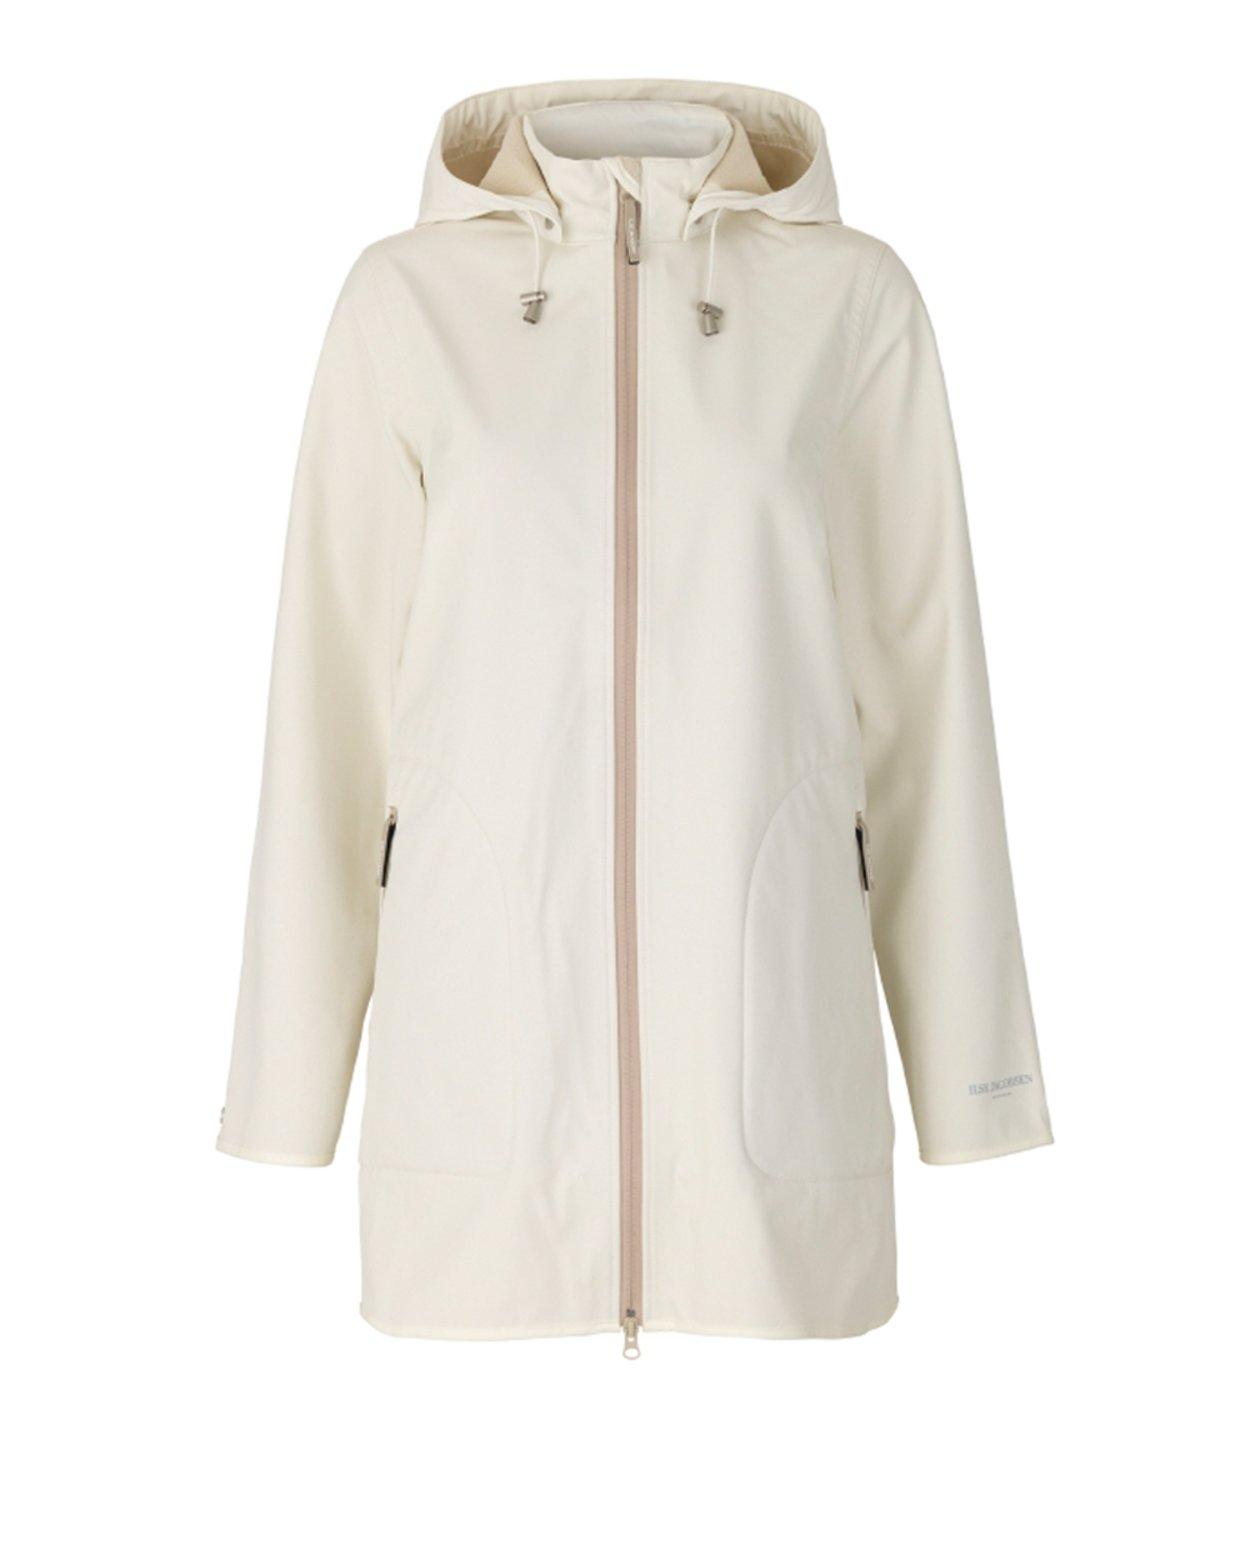 Short A-line Soft Shell Raincoat